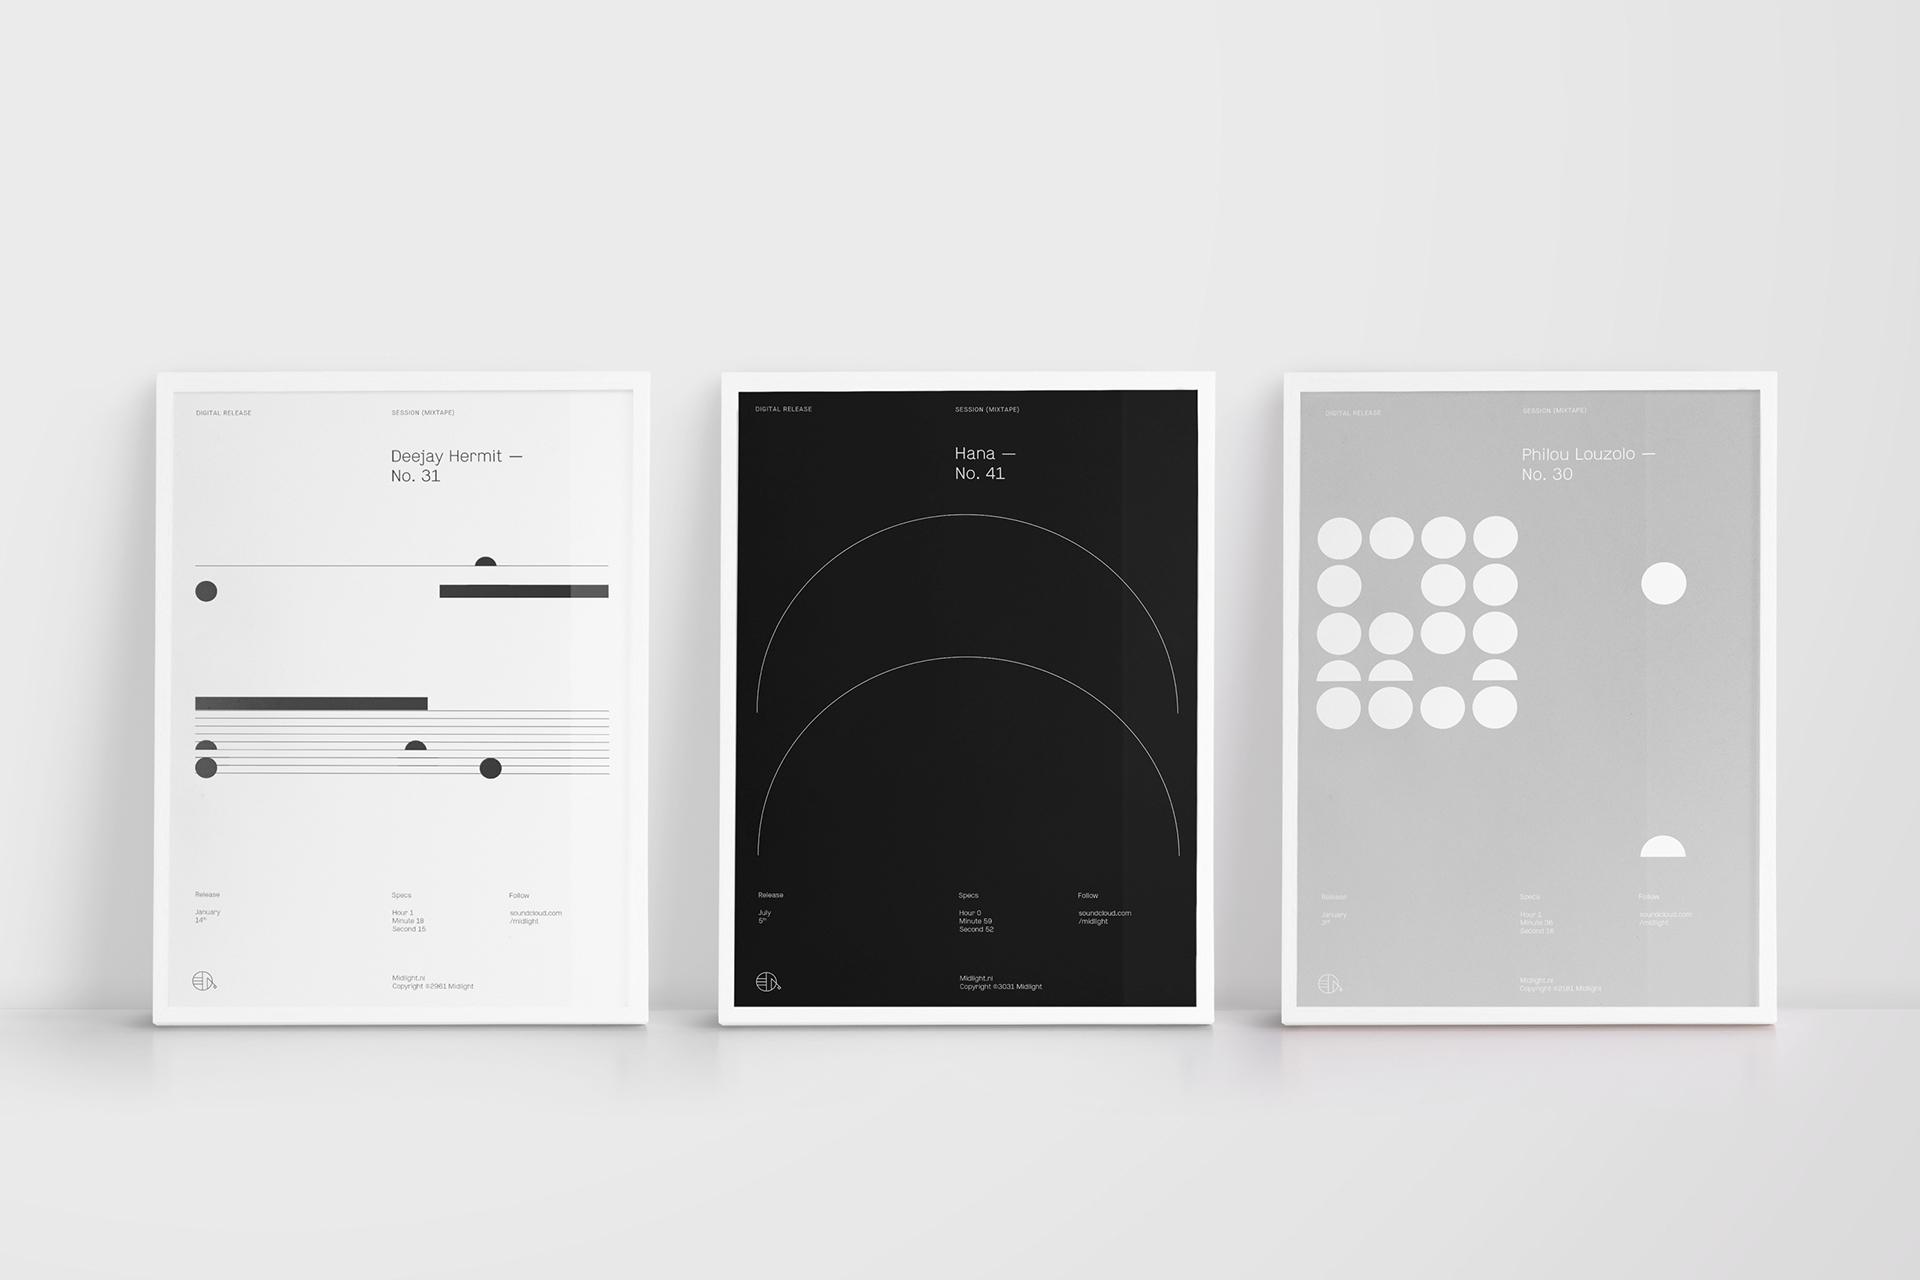 Midlight创意设计 欣赏-第2张